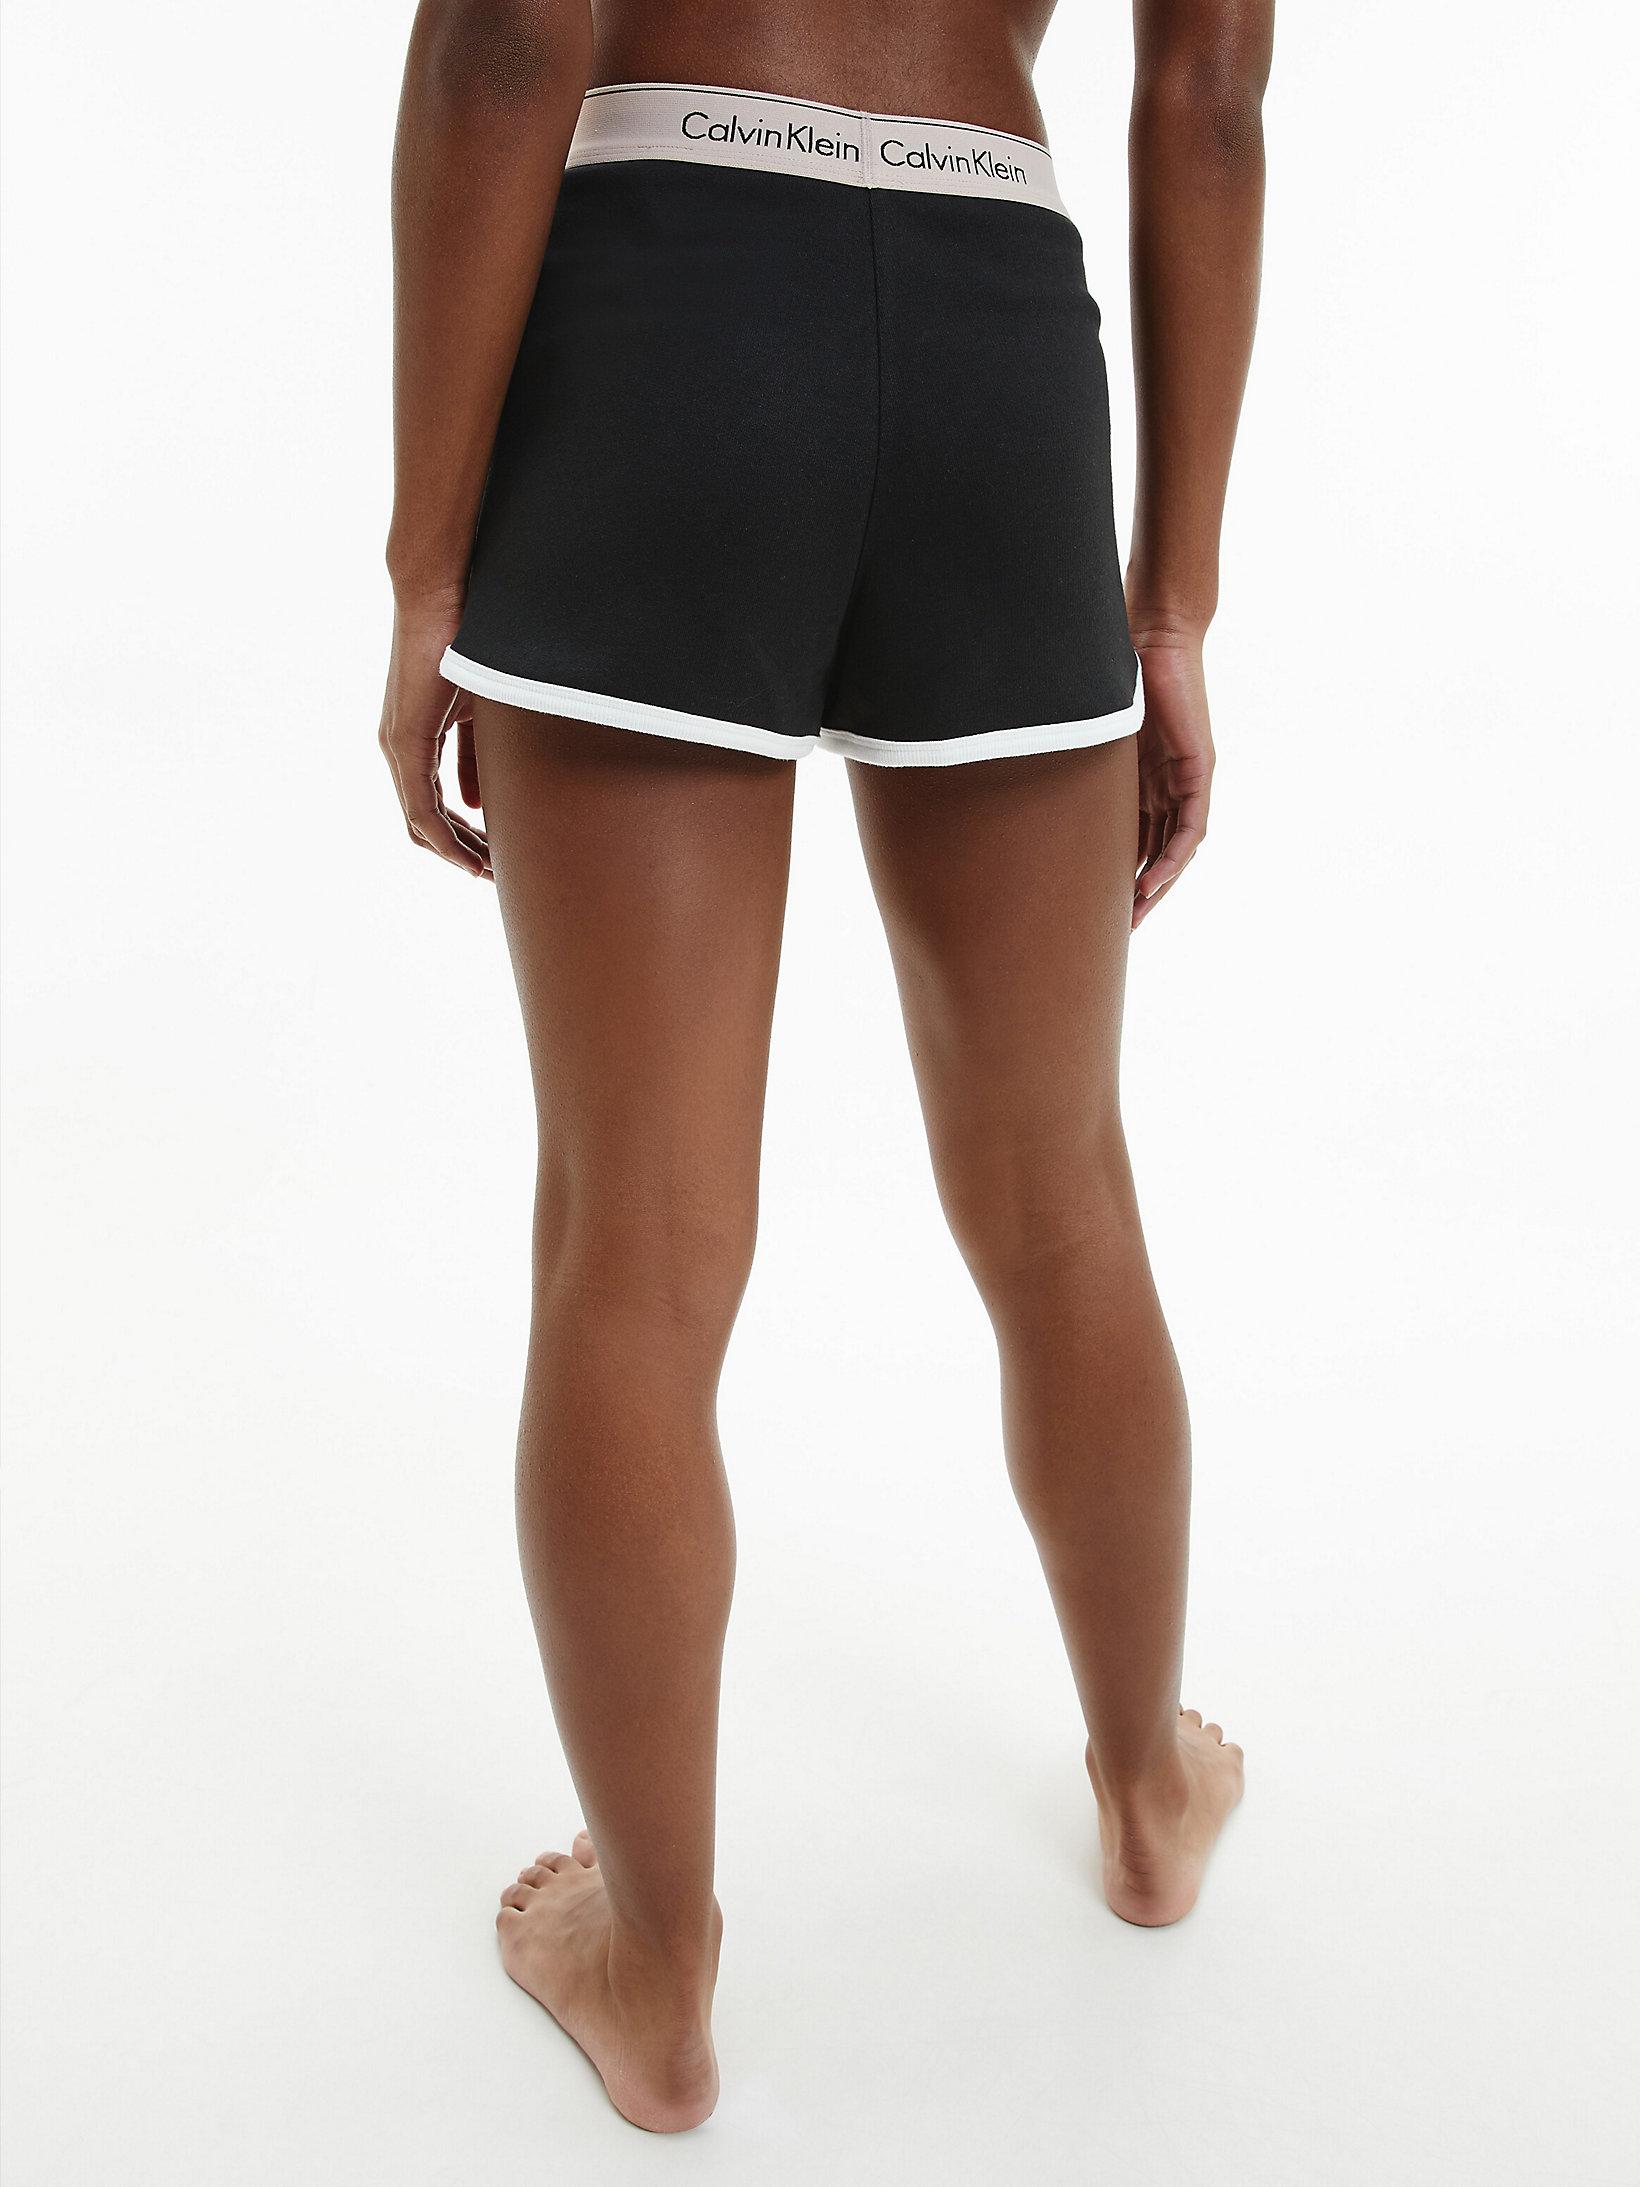 Calvin Klein Lounge Shorts Black